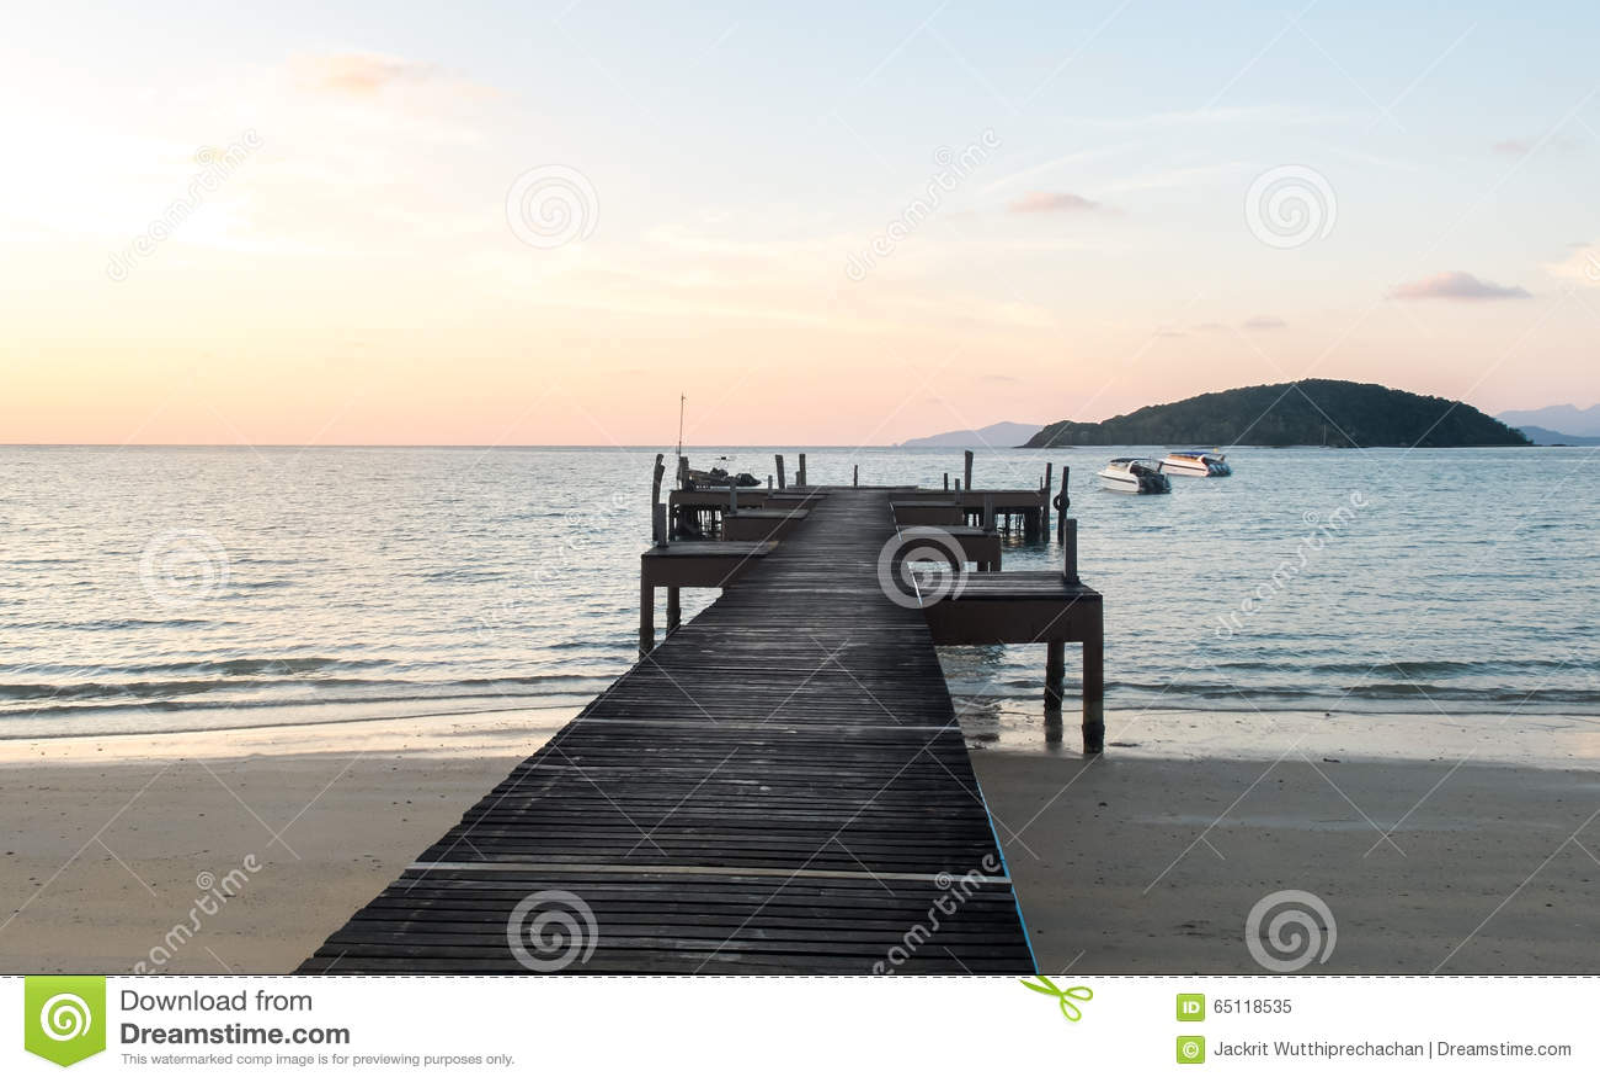 Conceito do tempo de férias, trajeto de madeira macio do filtro de cor do foco entre Crystal Clear Blue Sea e céu